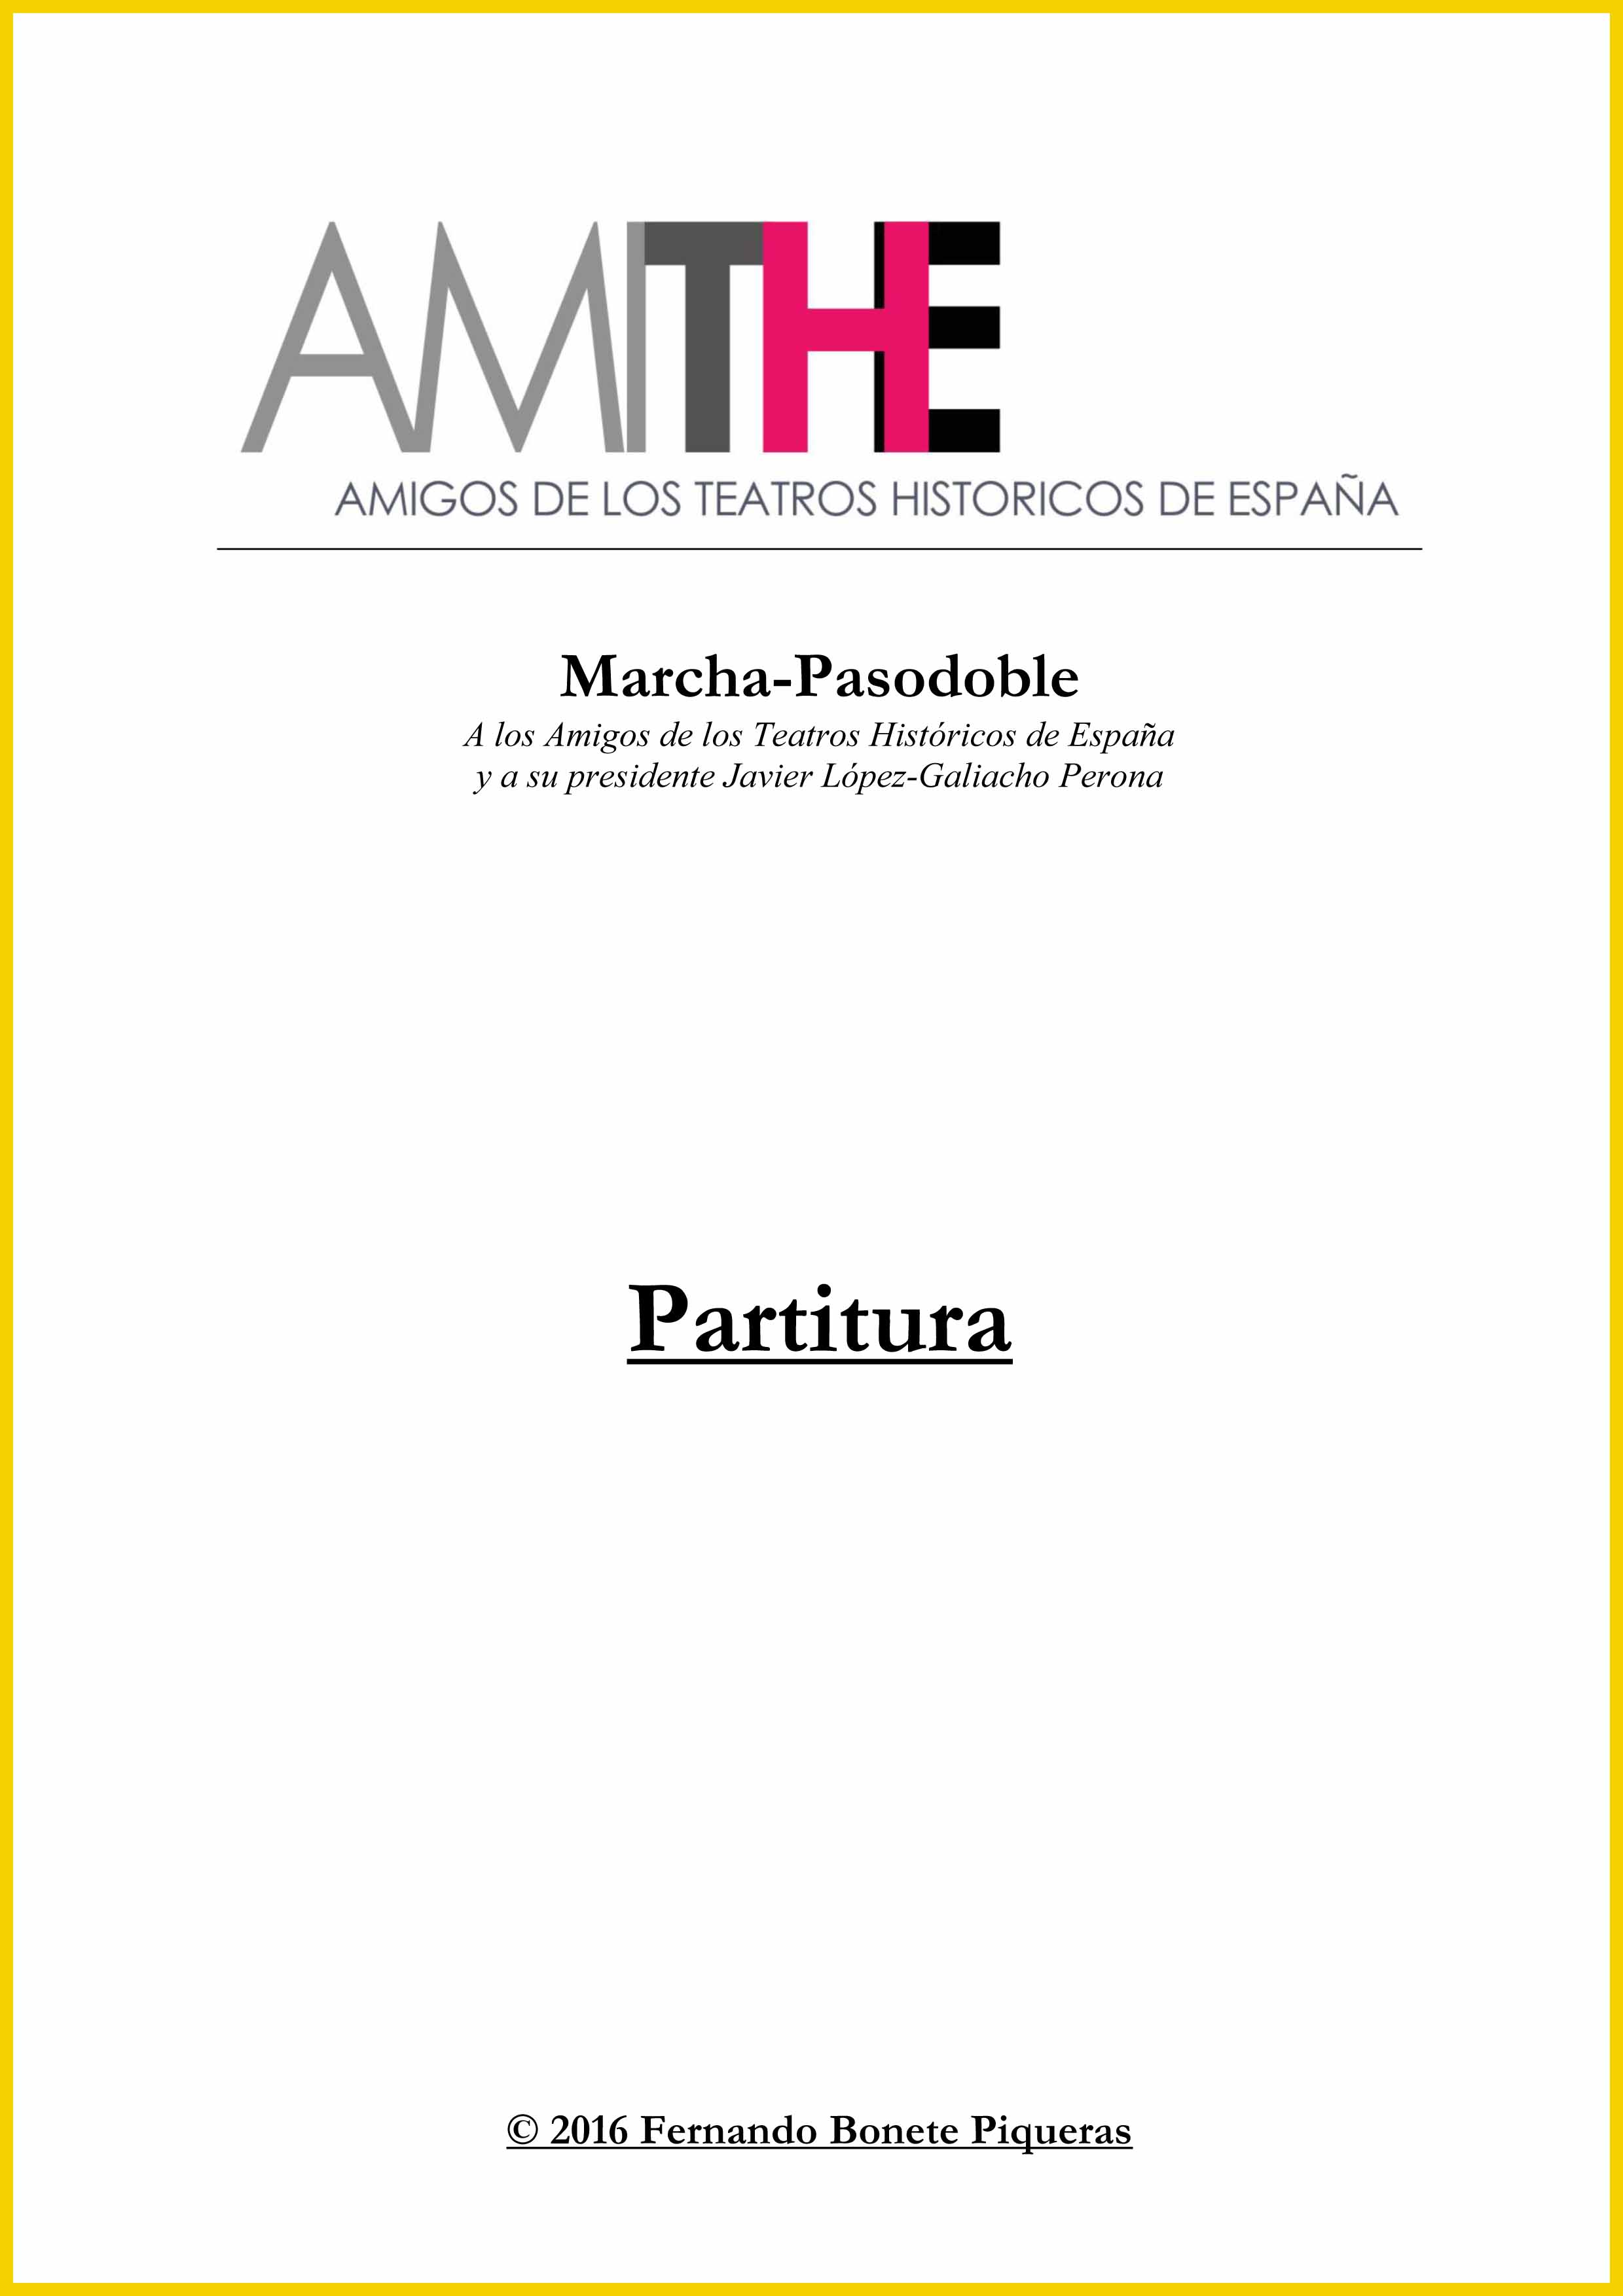 Microsoft Word - Portada Partitura para PDF